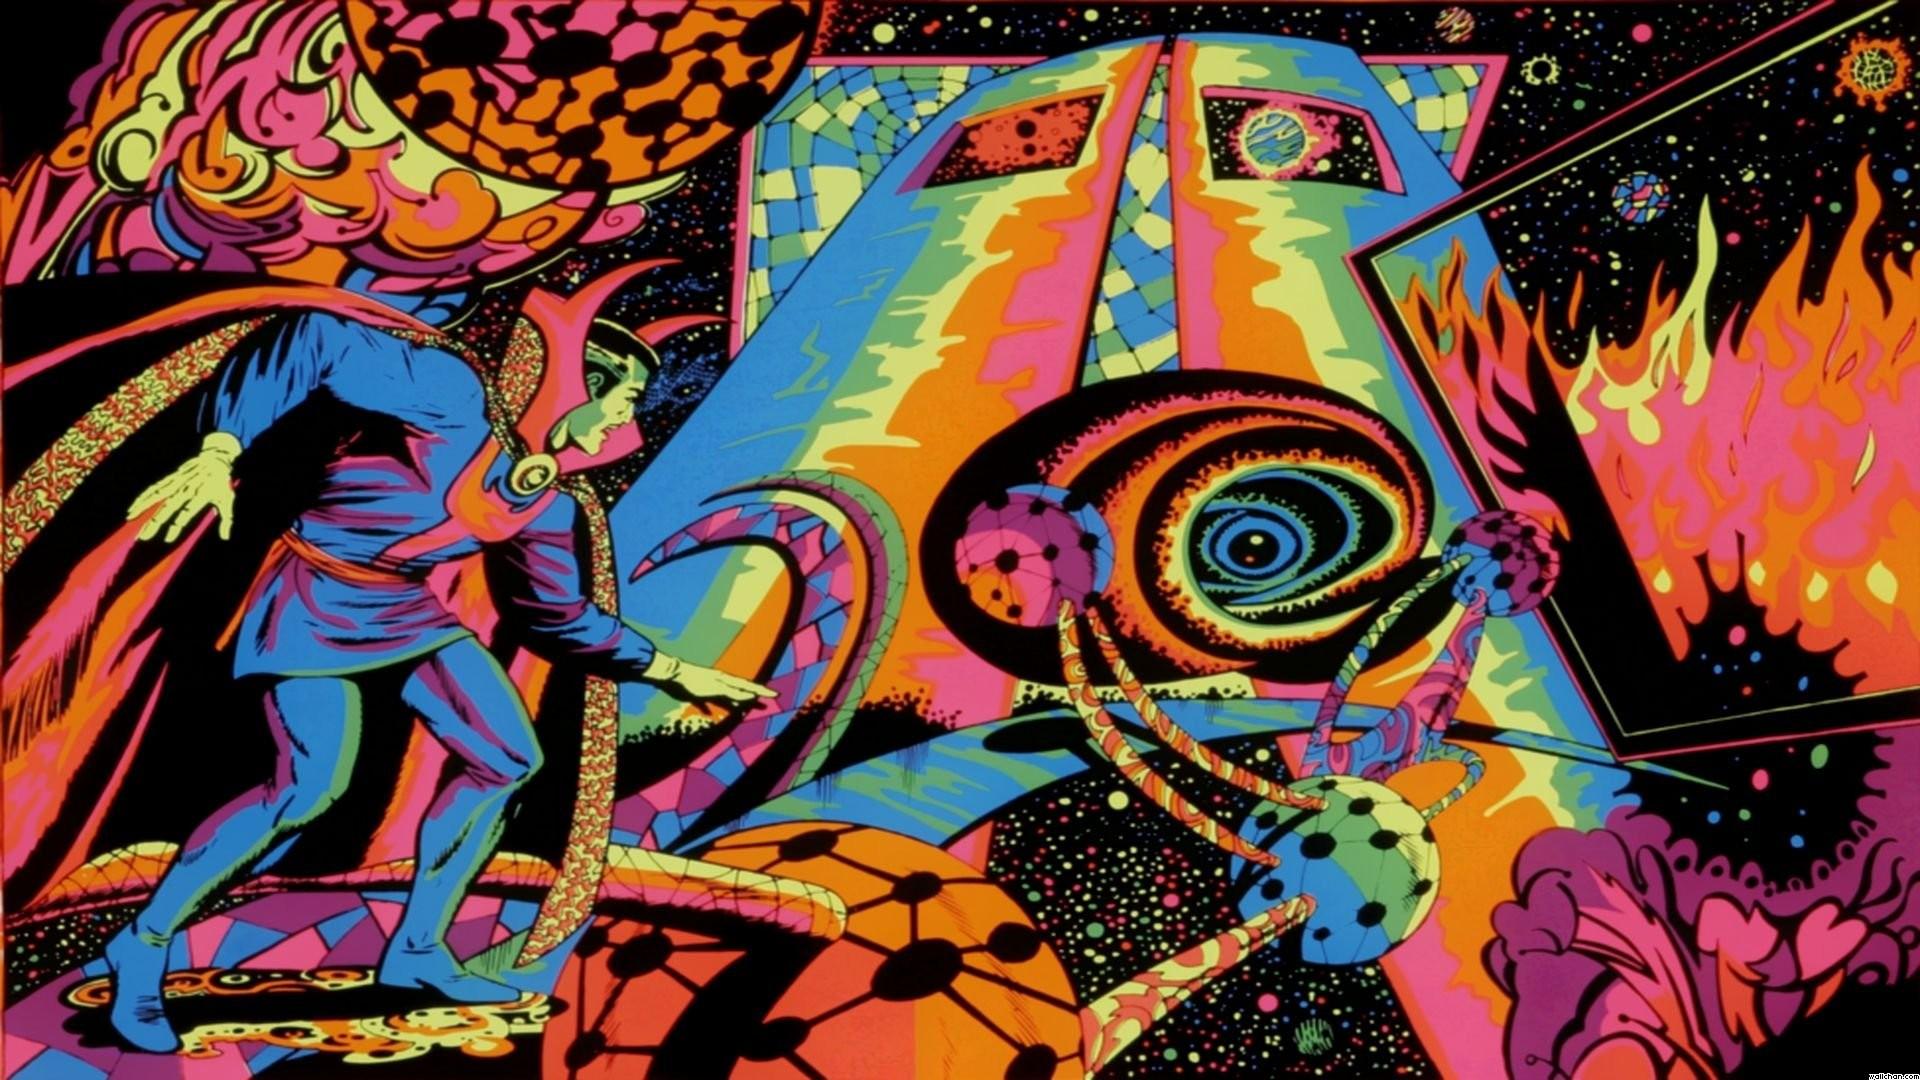 Cowboy Bebop Iphone X Wallpaper Doctor Strange Wallpaper 183 ① Download Free Awesome